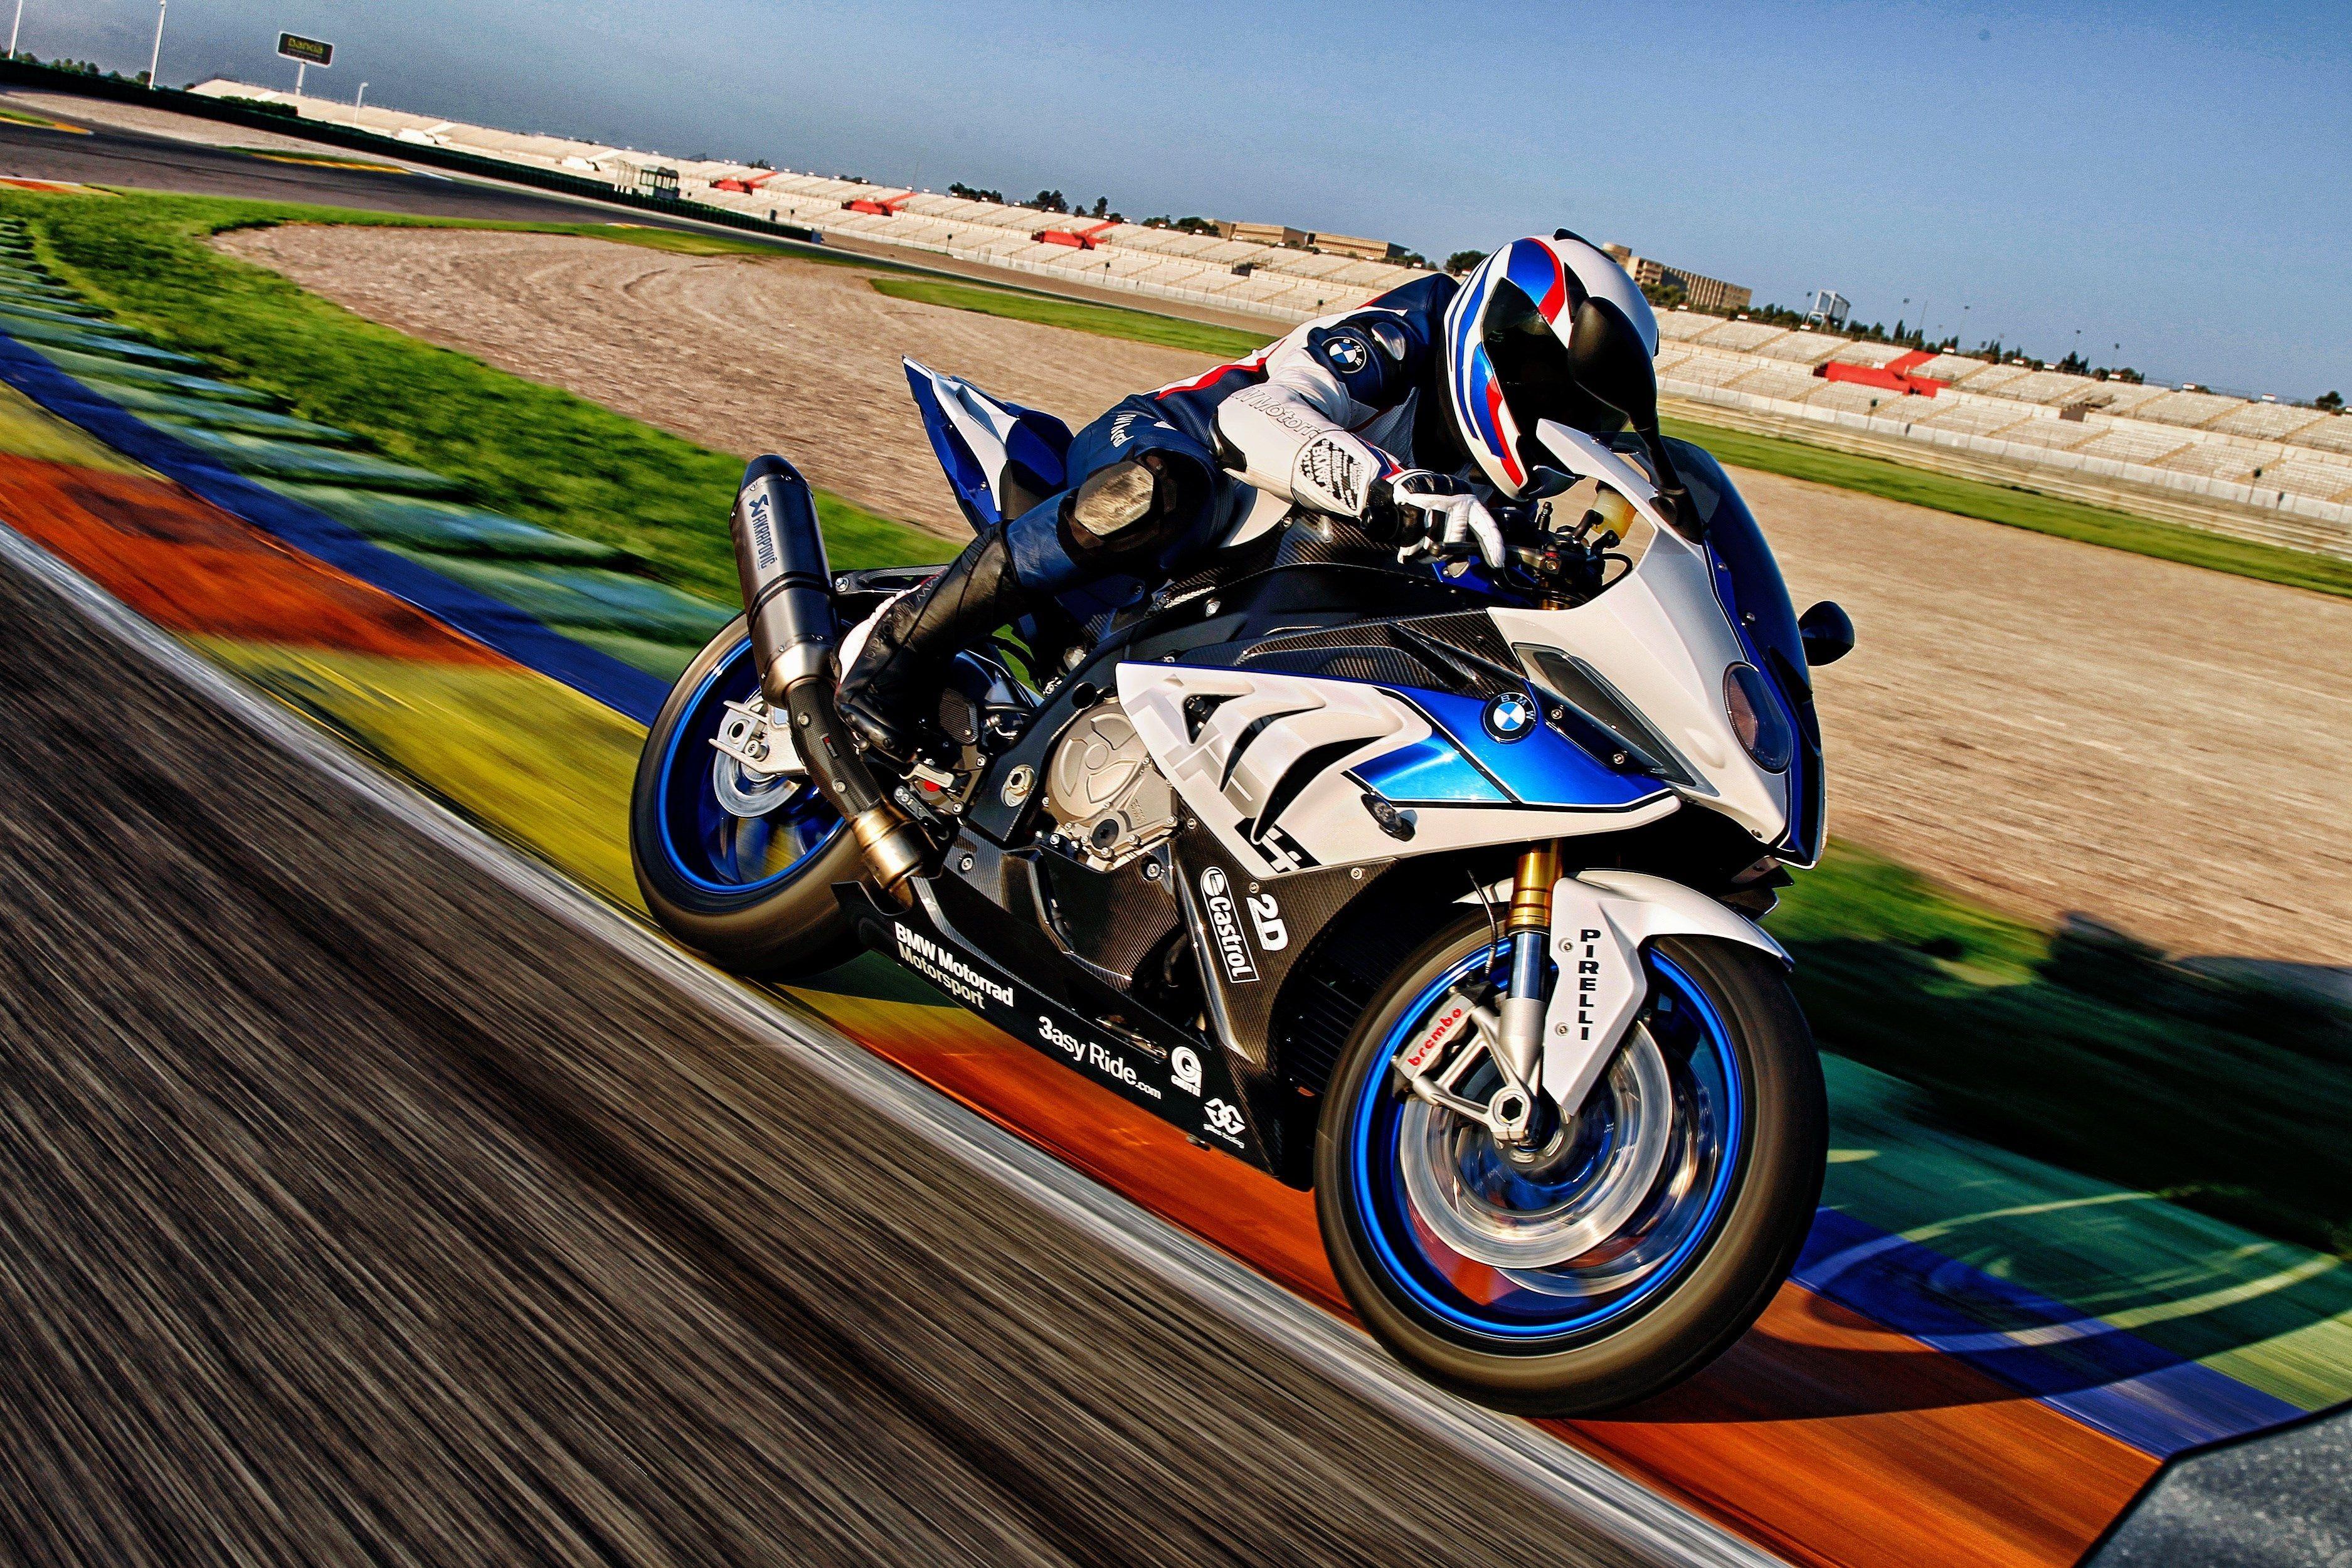 3750x2500 Bmw Hp4 4k Amazing Wallpaper Free Download Bmw Motorrad Bmw S1000rr Bmw Motors